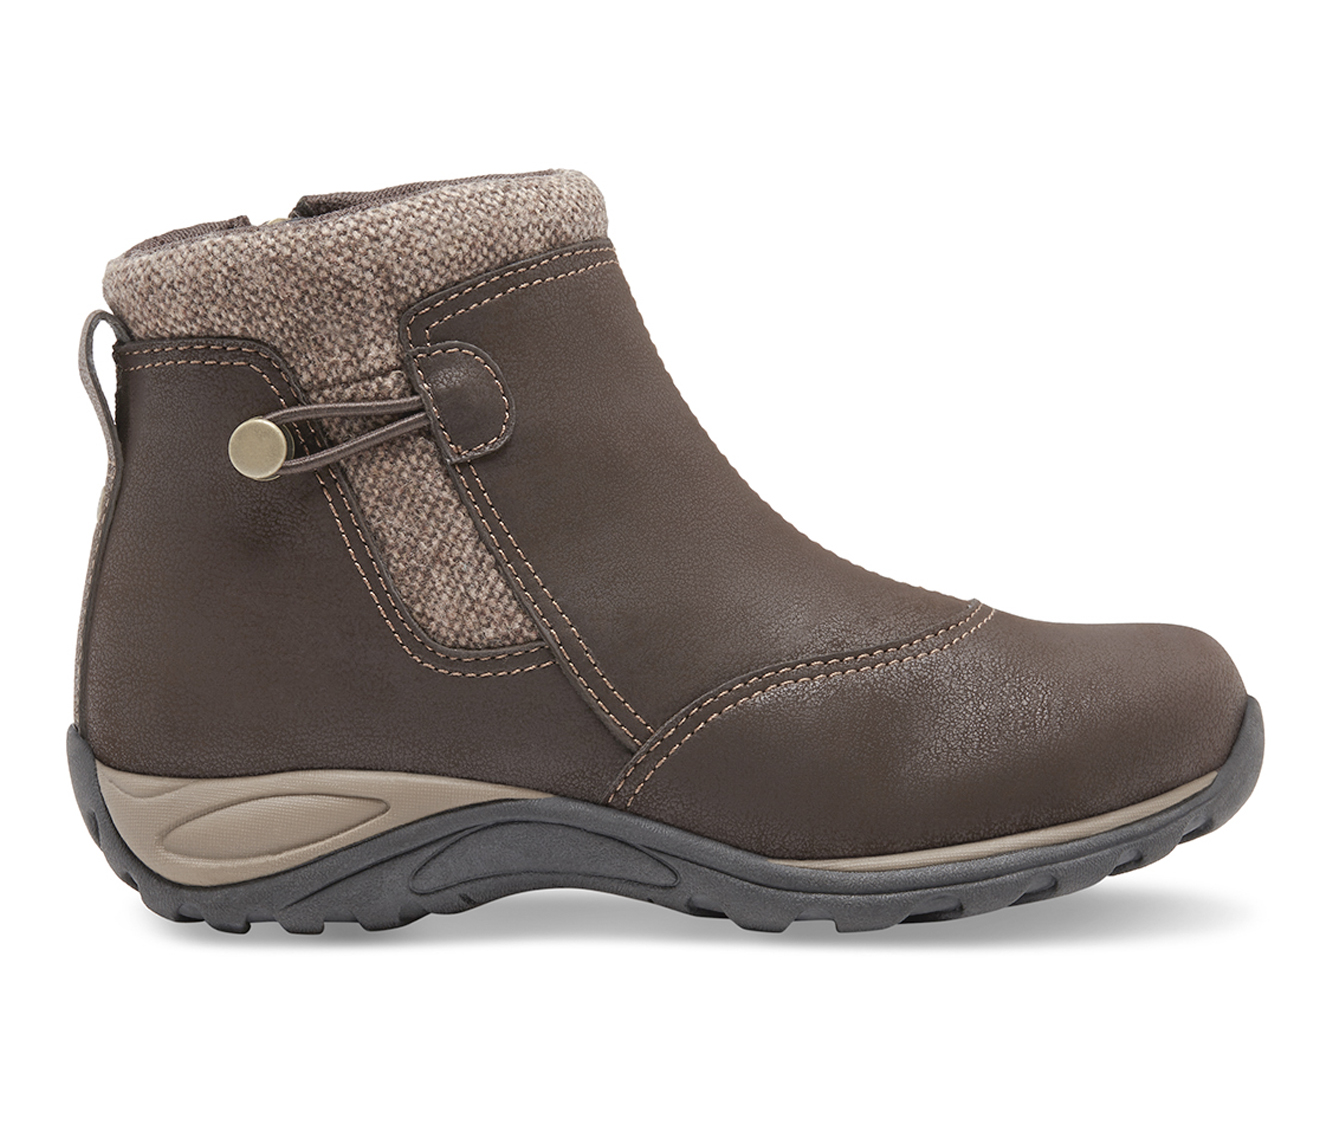 Eastland Bridget Women's Boot (Brown Leather)